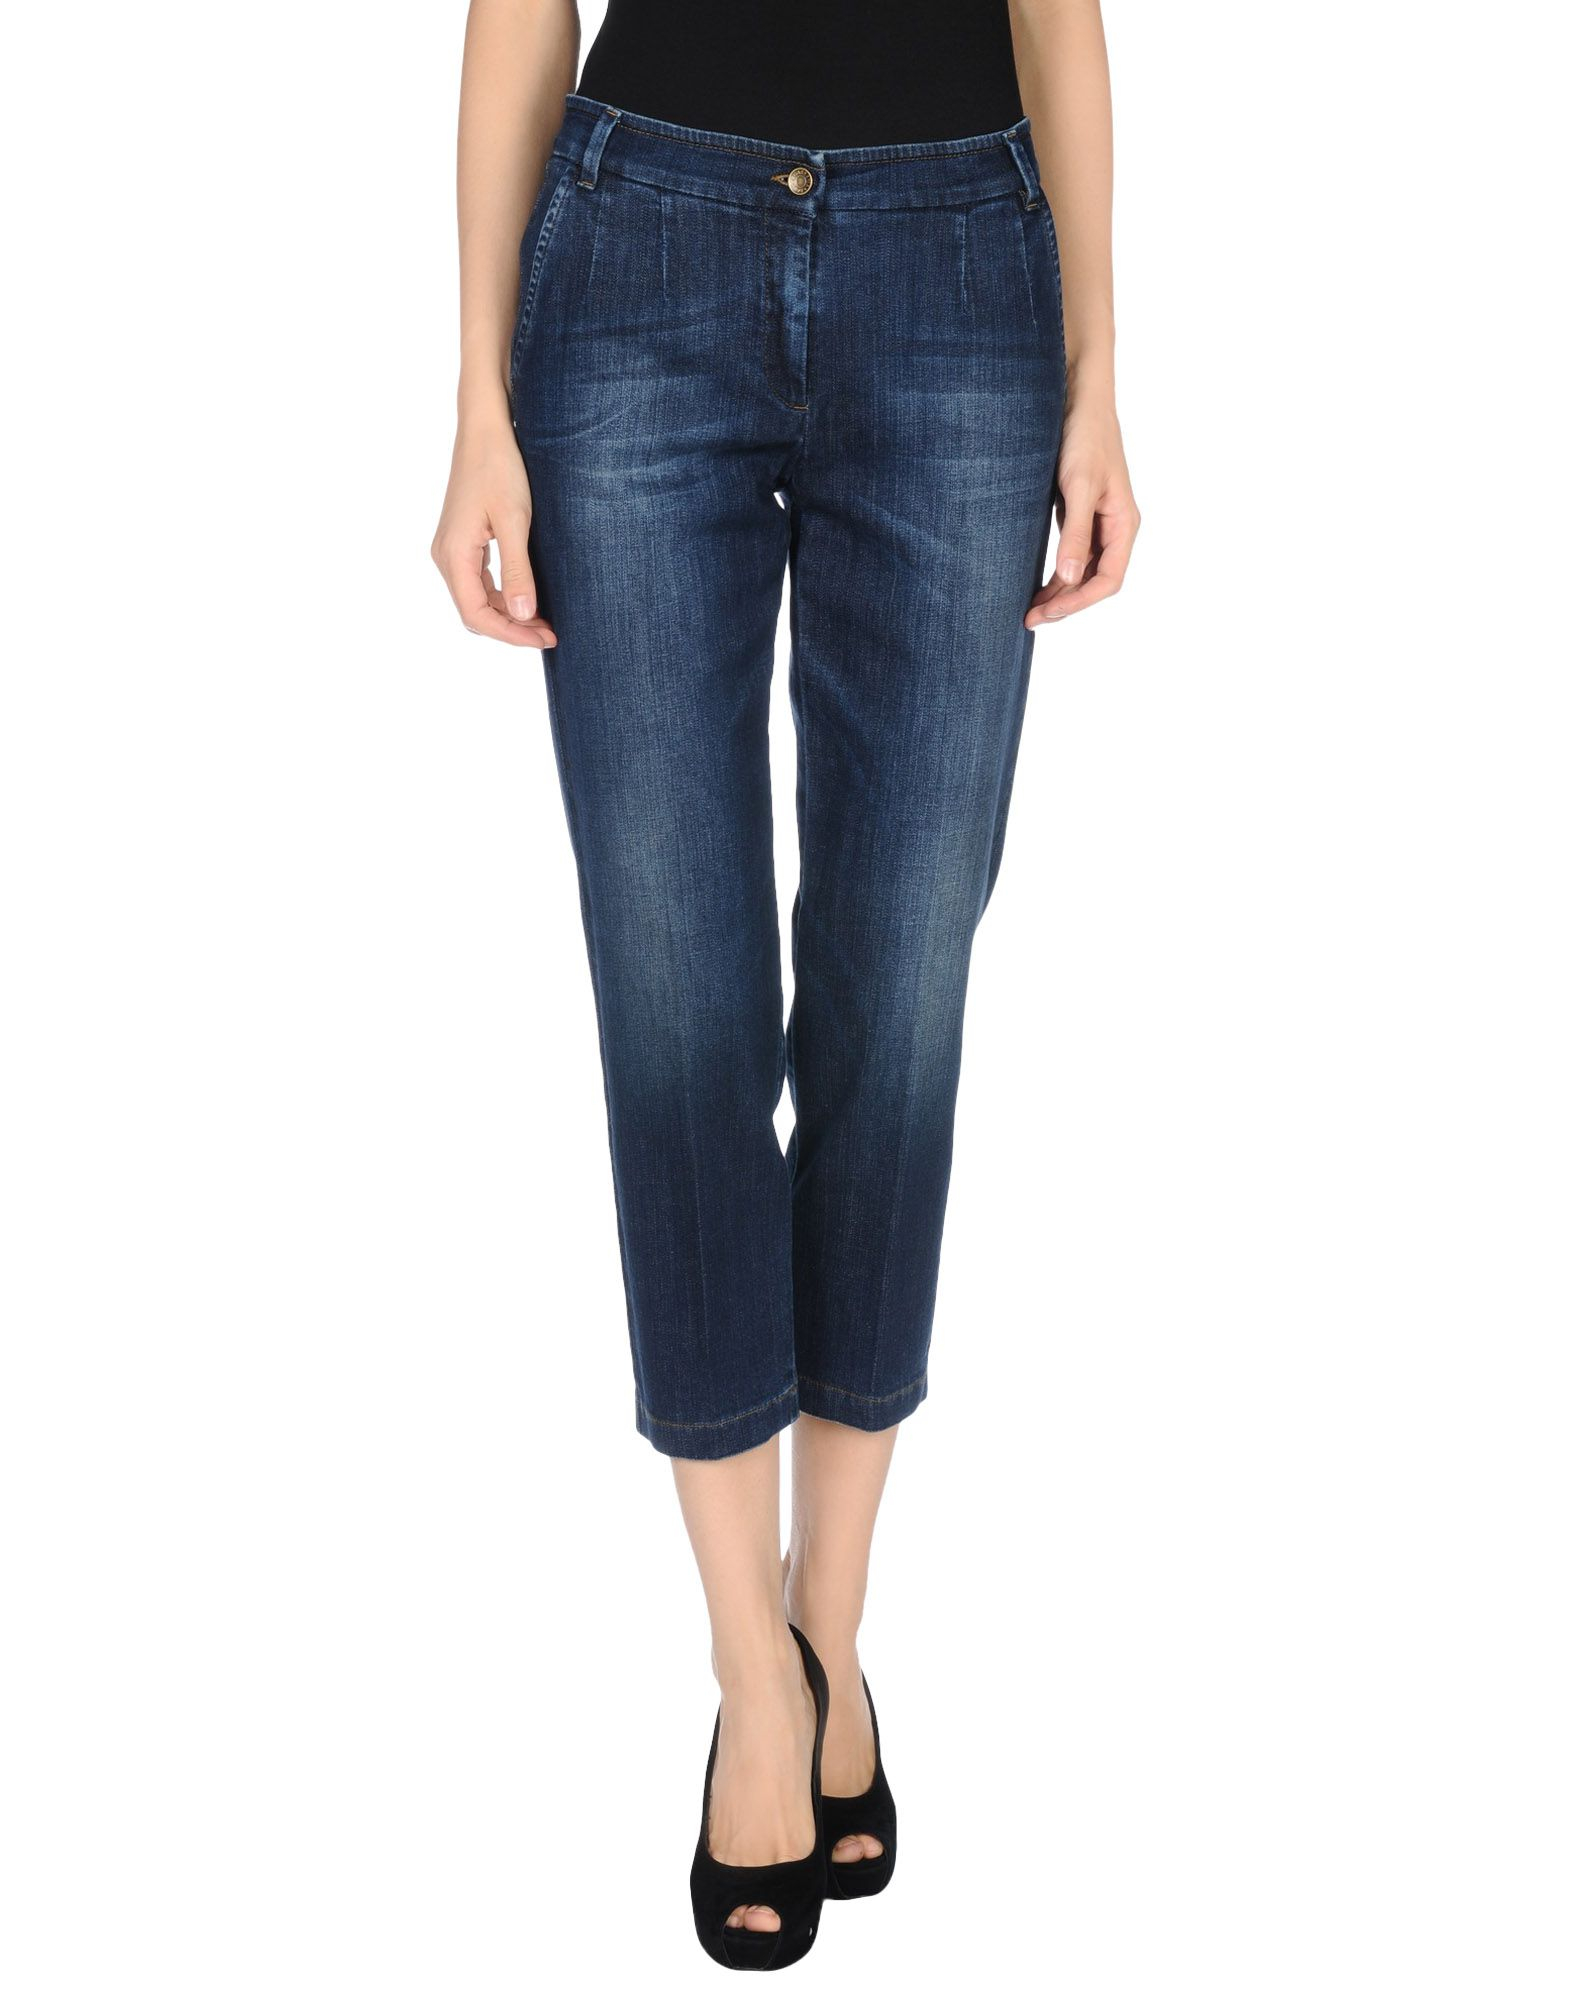 dolce gabbana denim trousers in blue lyst. Black Bedroom Furniture Sets. Home Design Ideas